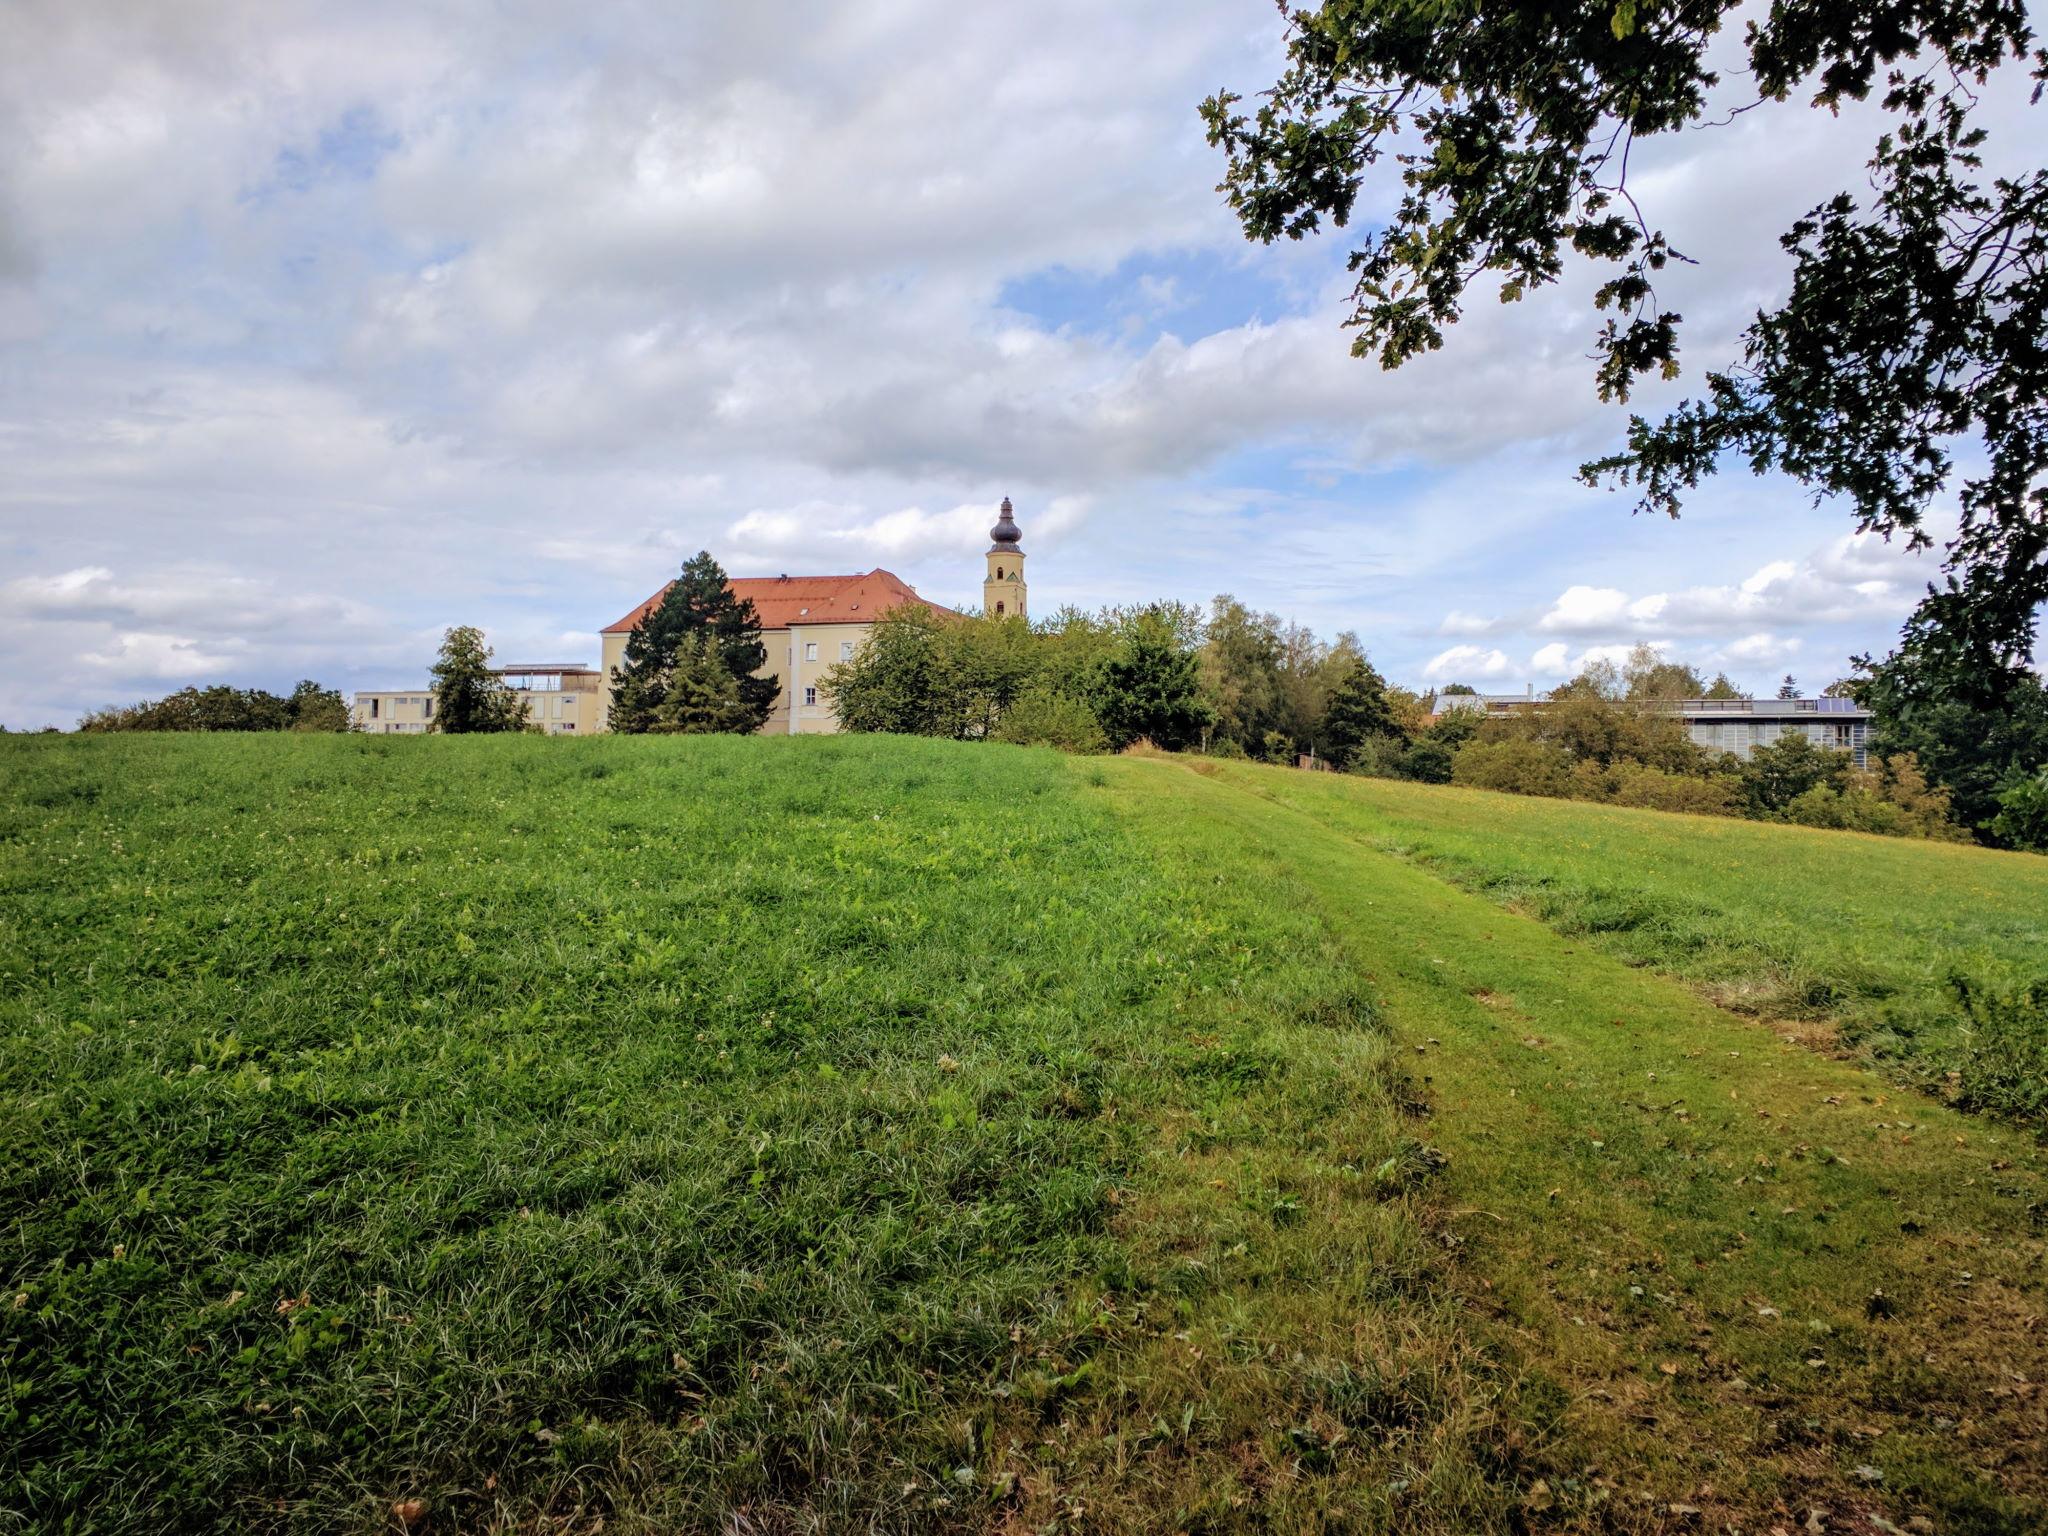 Kloster Windberg